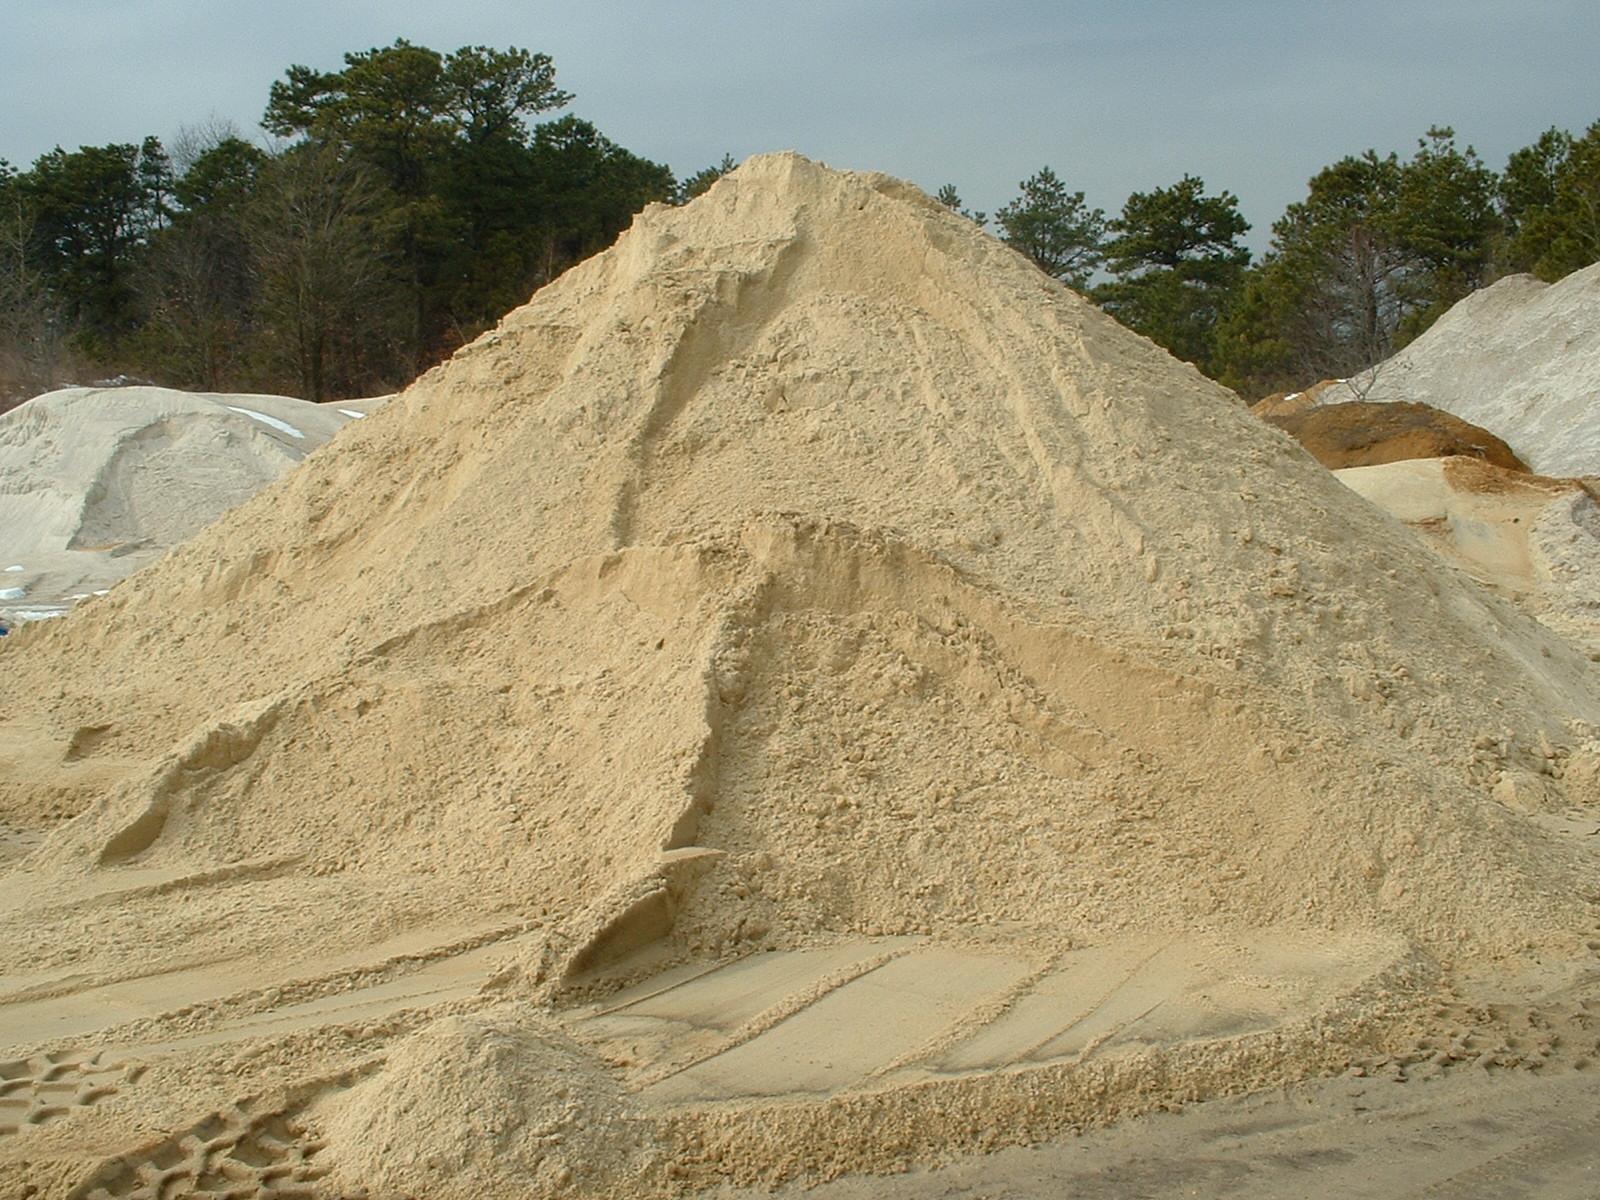 Sand piles photo